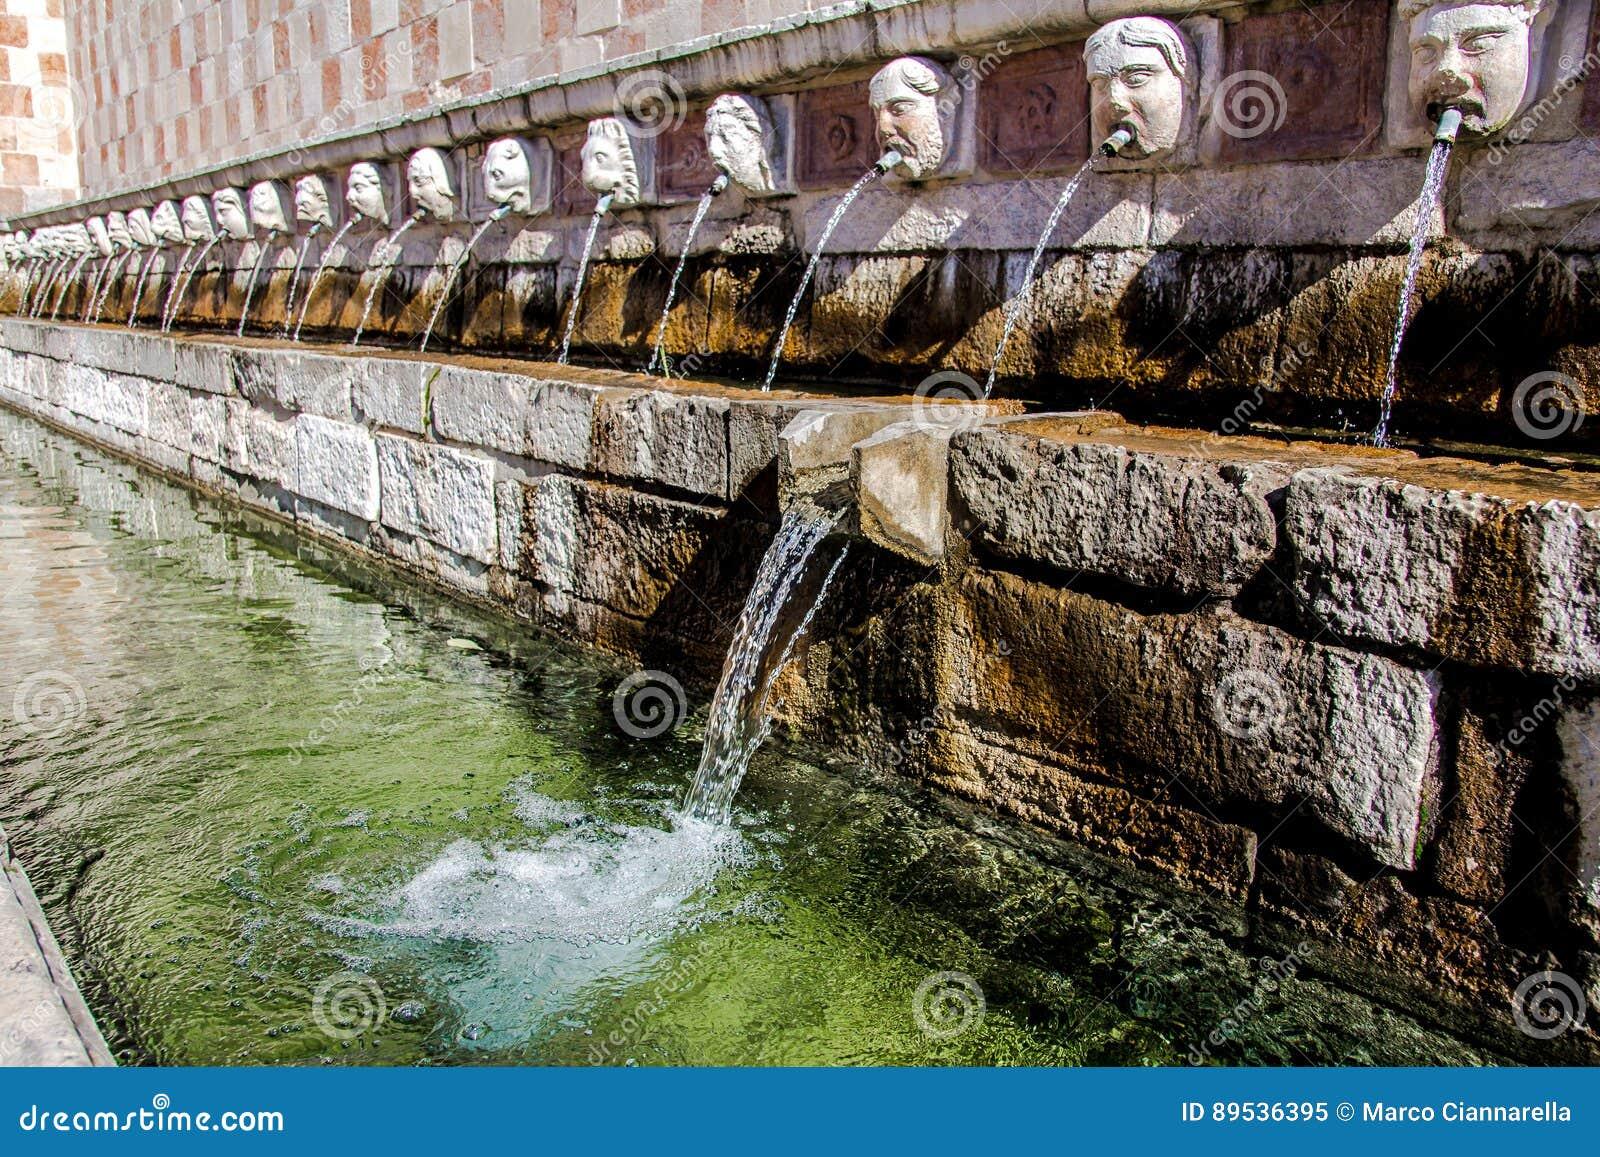 99喷口Fontana delle 99 cannelle的喷泉, L天鹰座